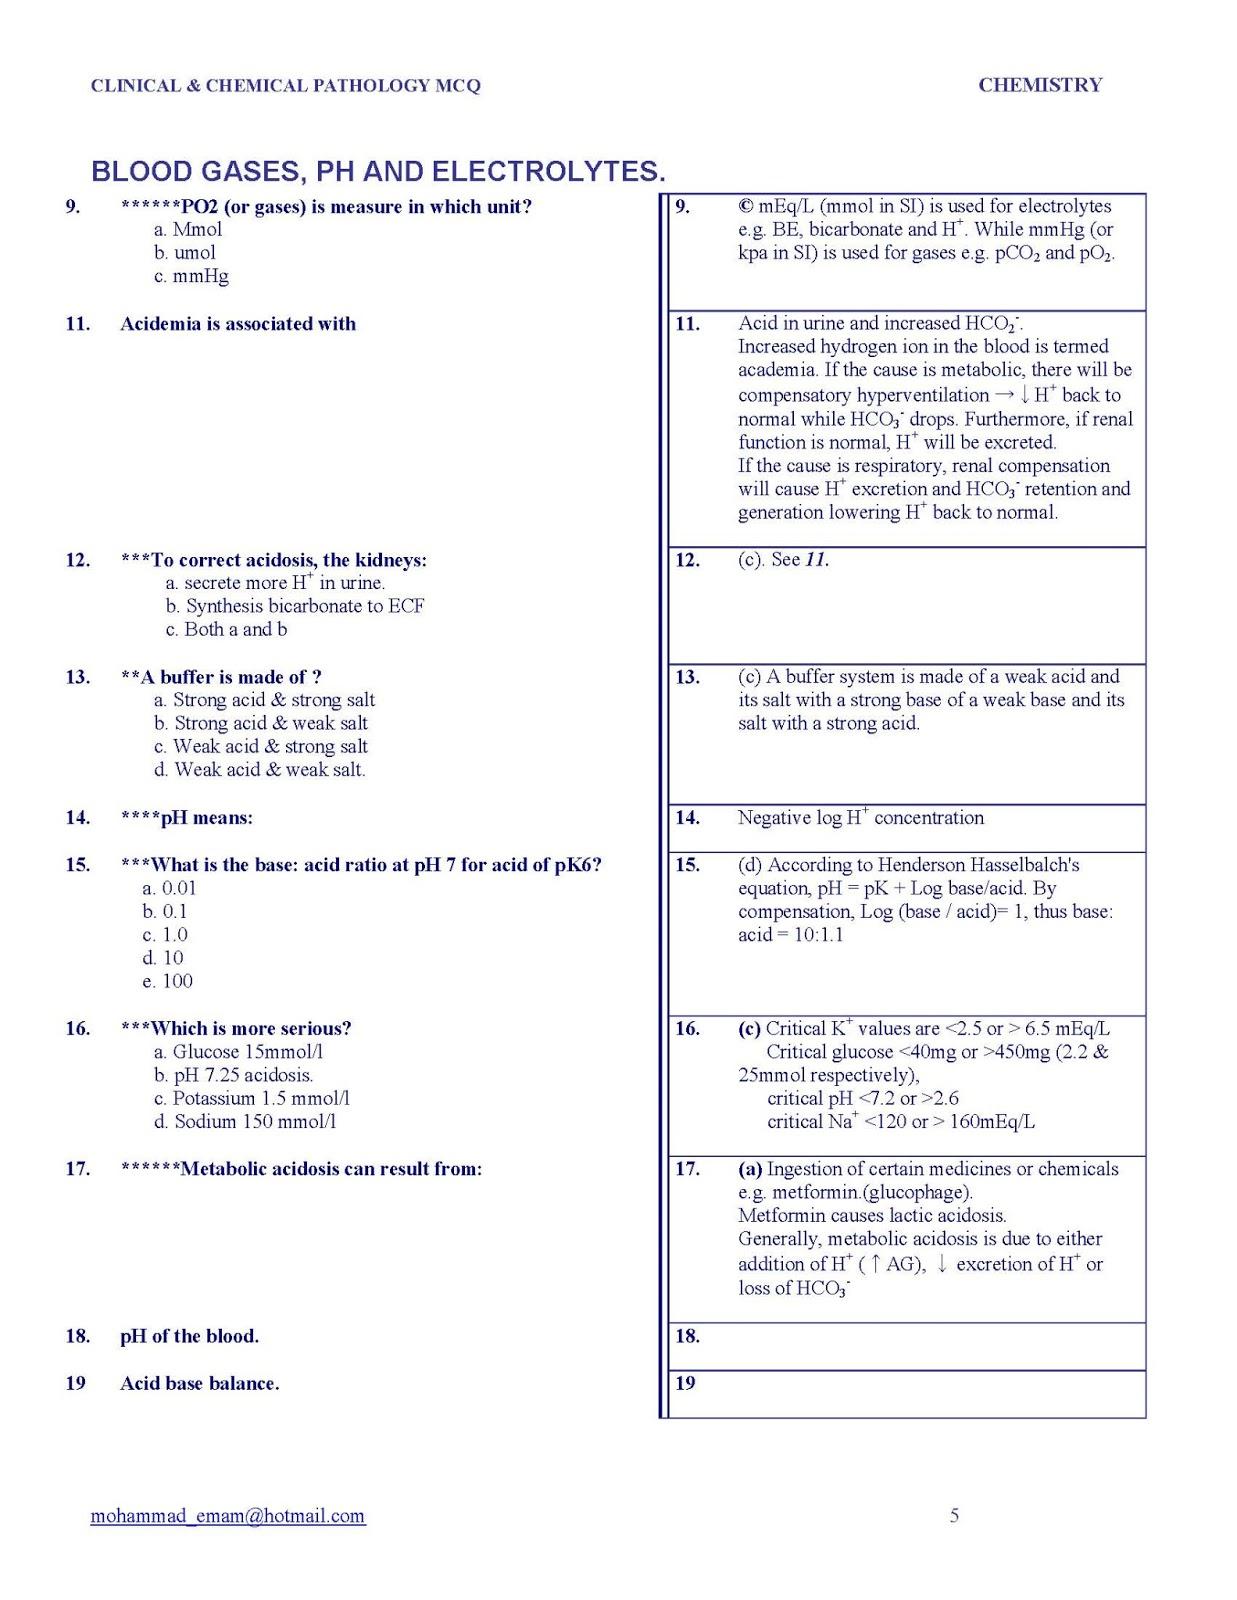 dr ehab aboueladab phd in biochemistry clinical chemical rh ehab10f blogspot com Biochemistry Test Chemistry Exams and Answers